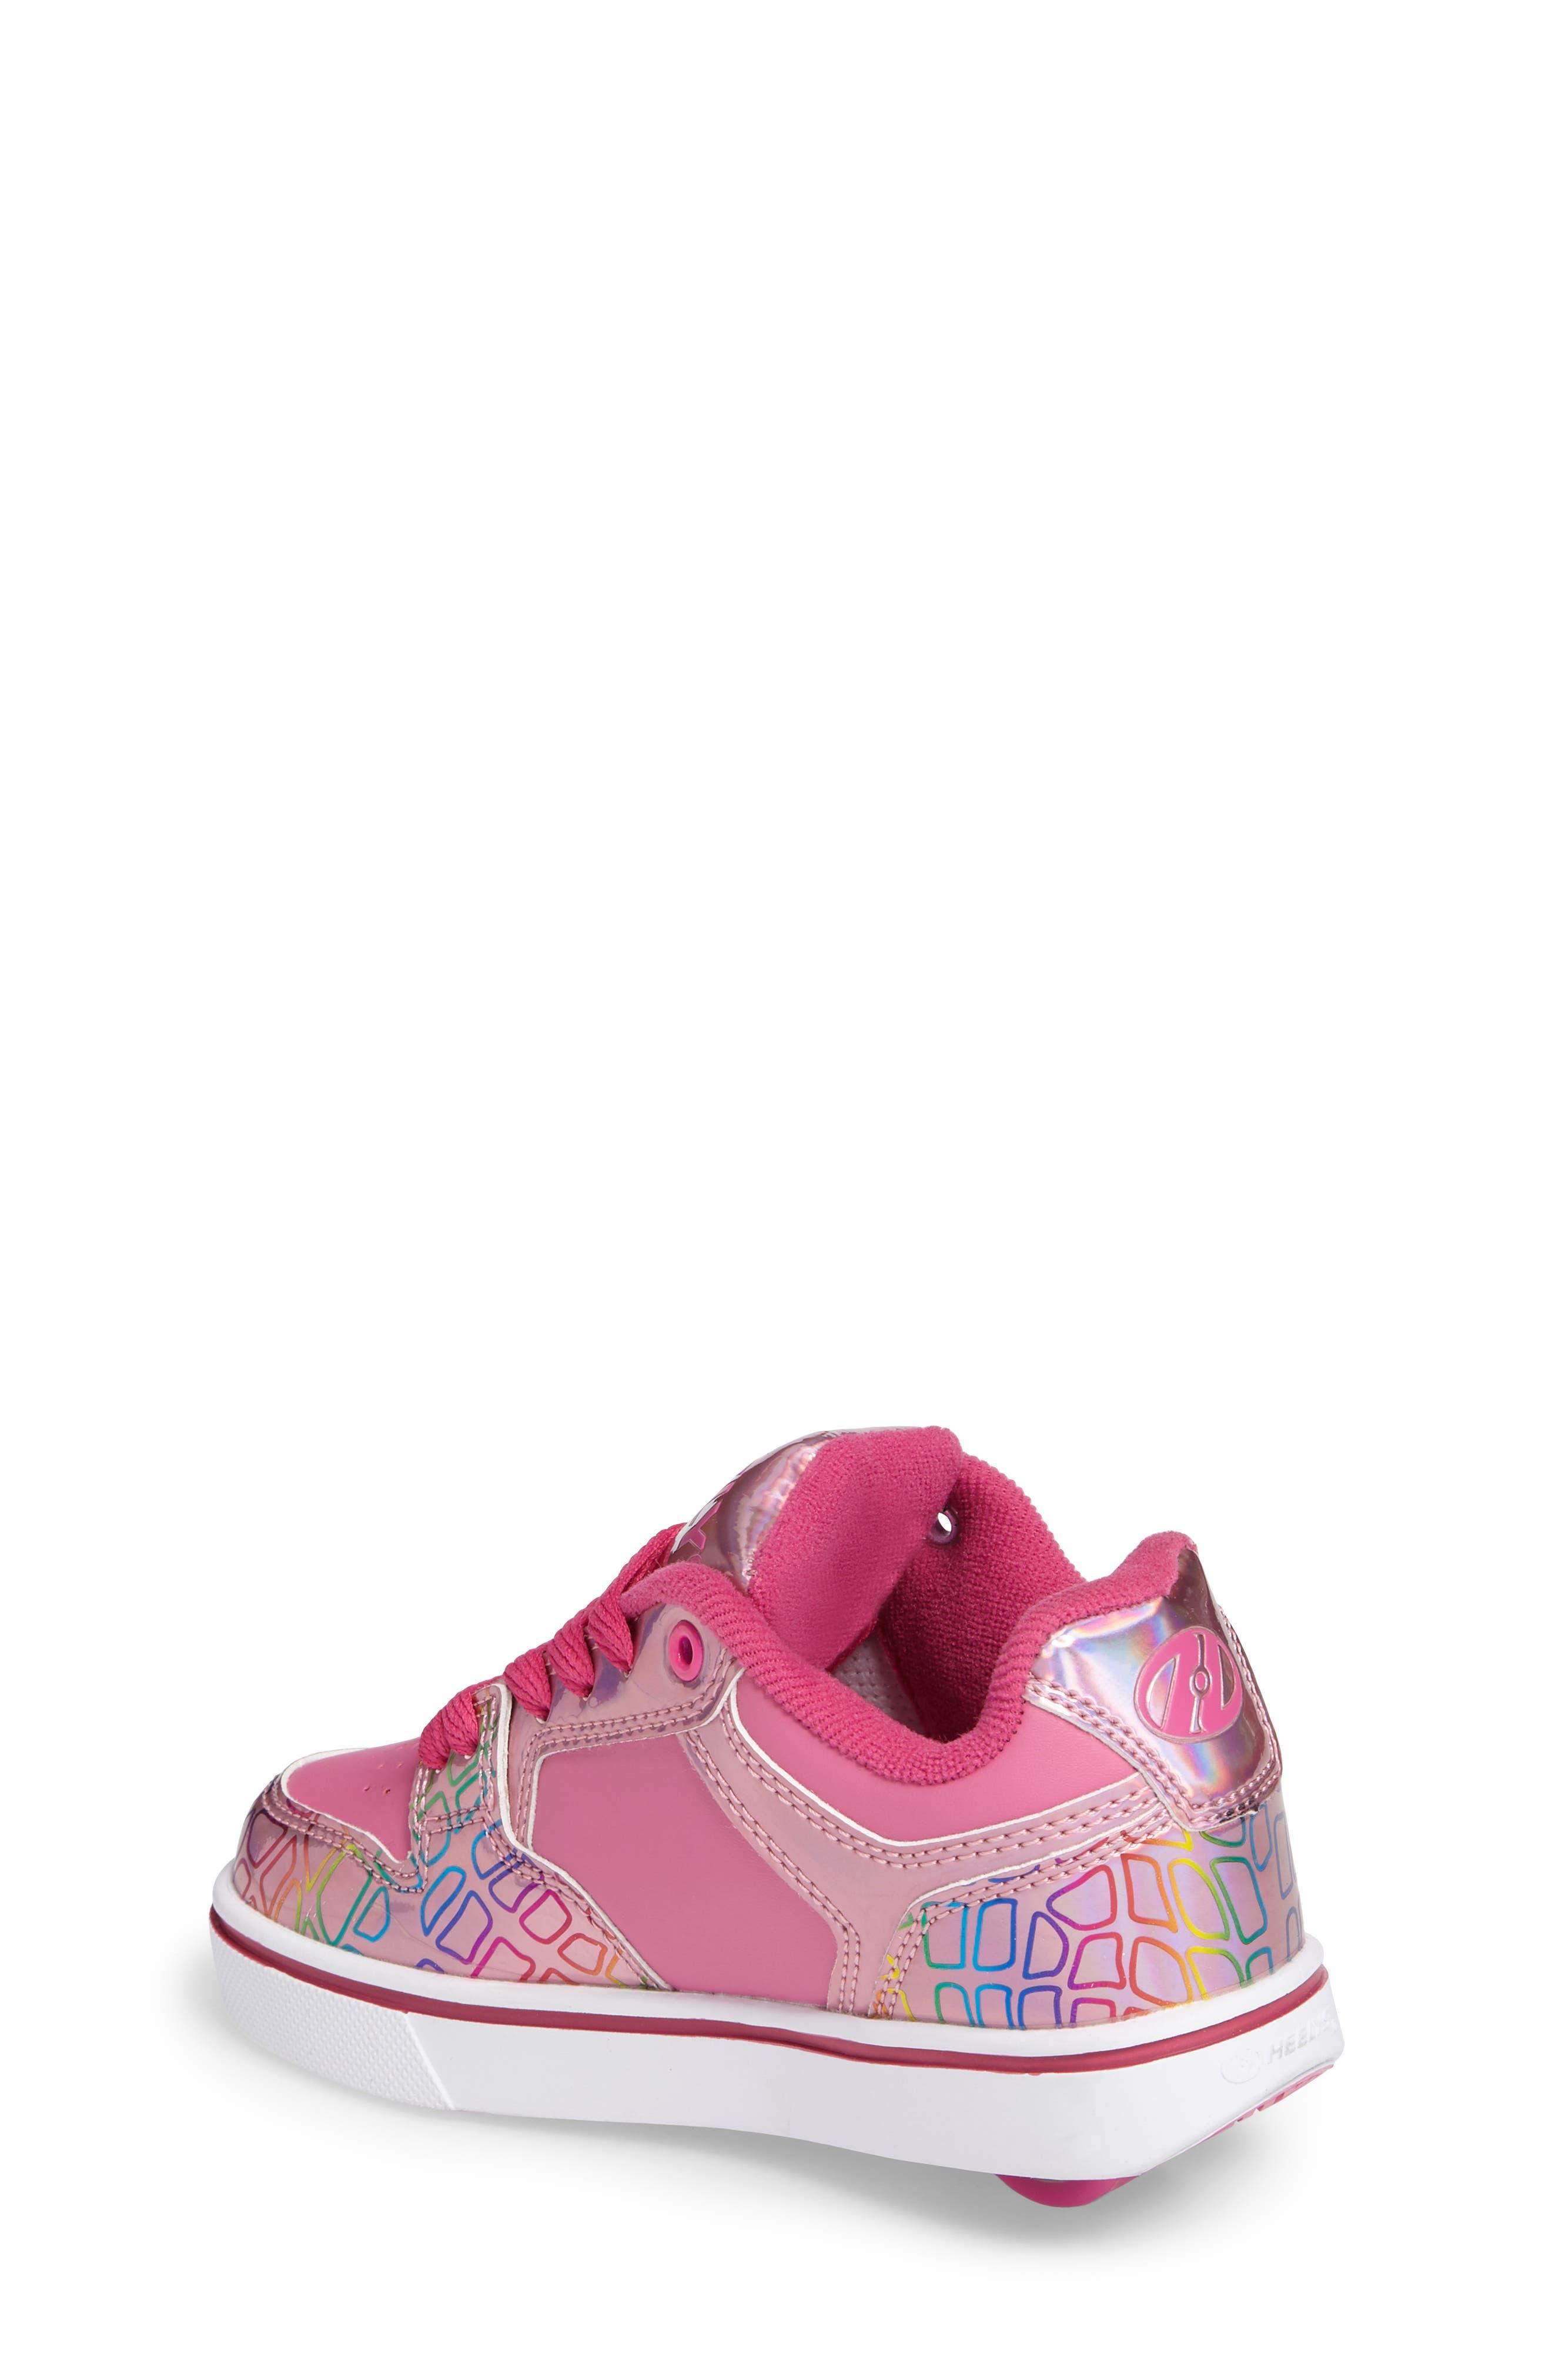 Motion Plus Skate Sneaker,                             Alternate thumbnail 2, color,                             PINK/ LIGHT PINK